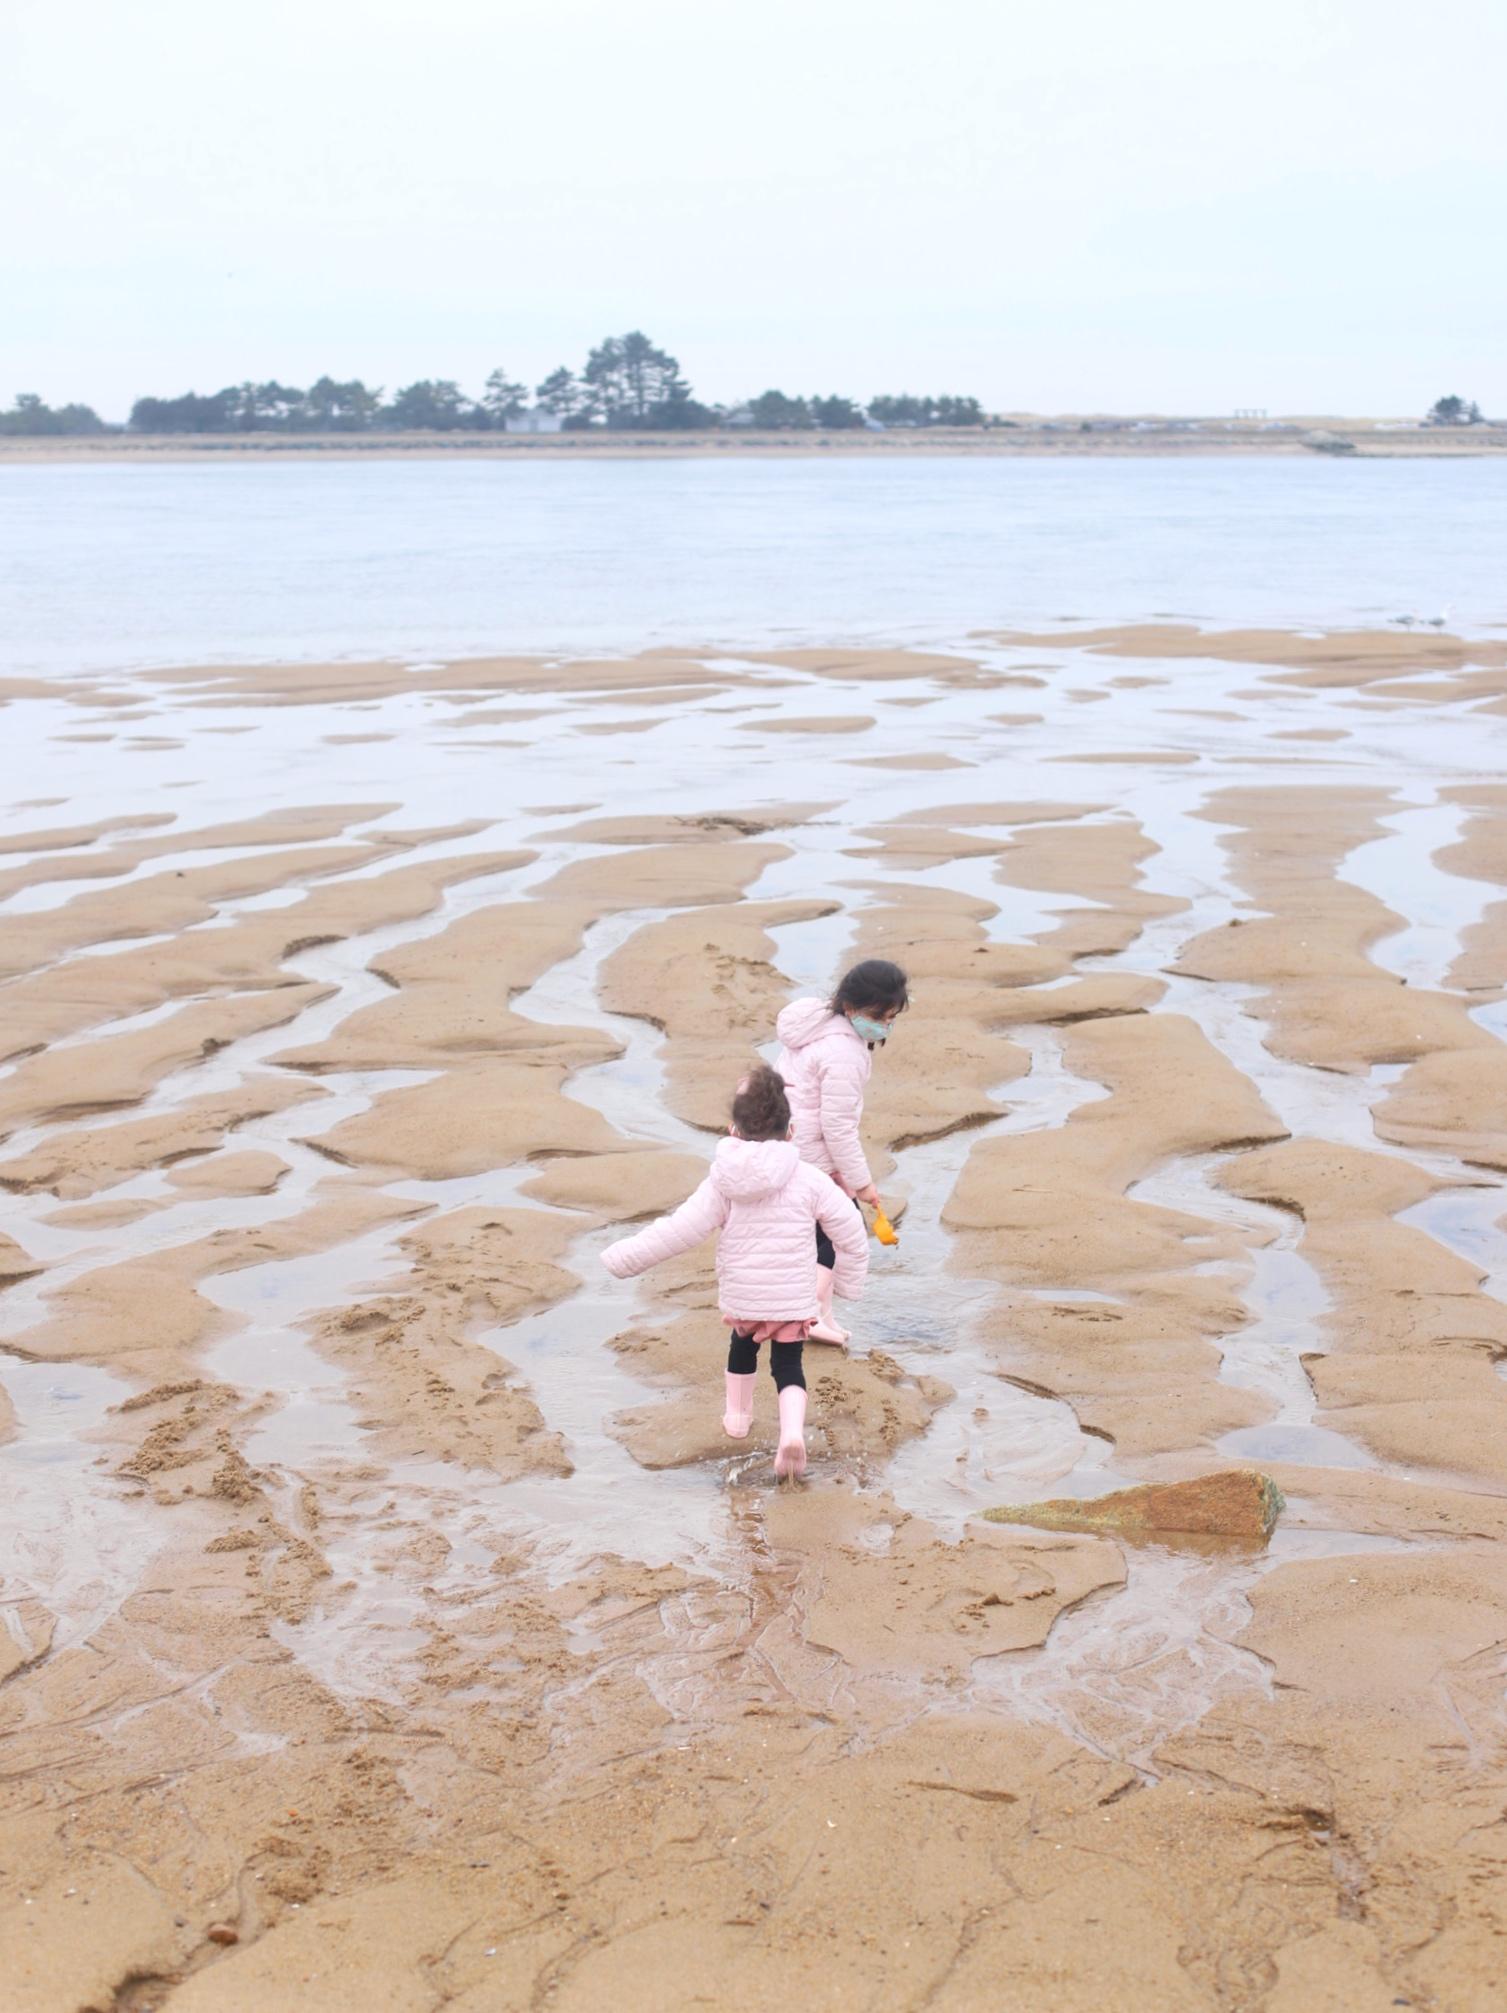 Beach Day Photo Diary